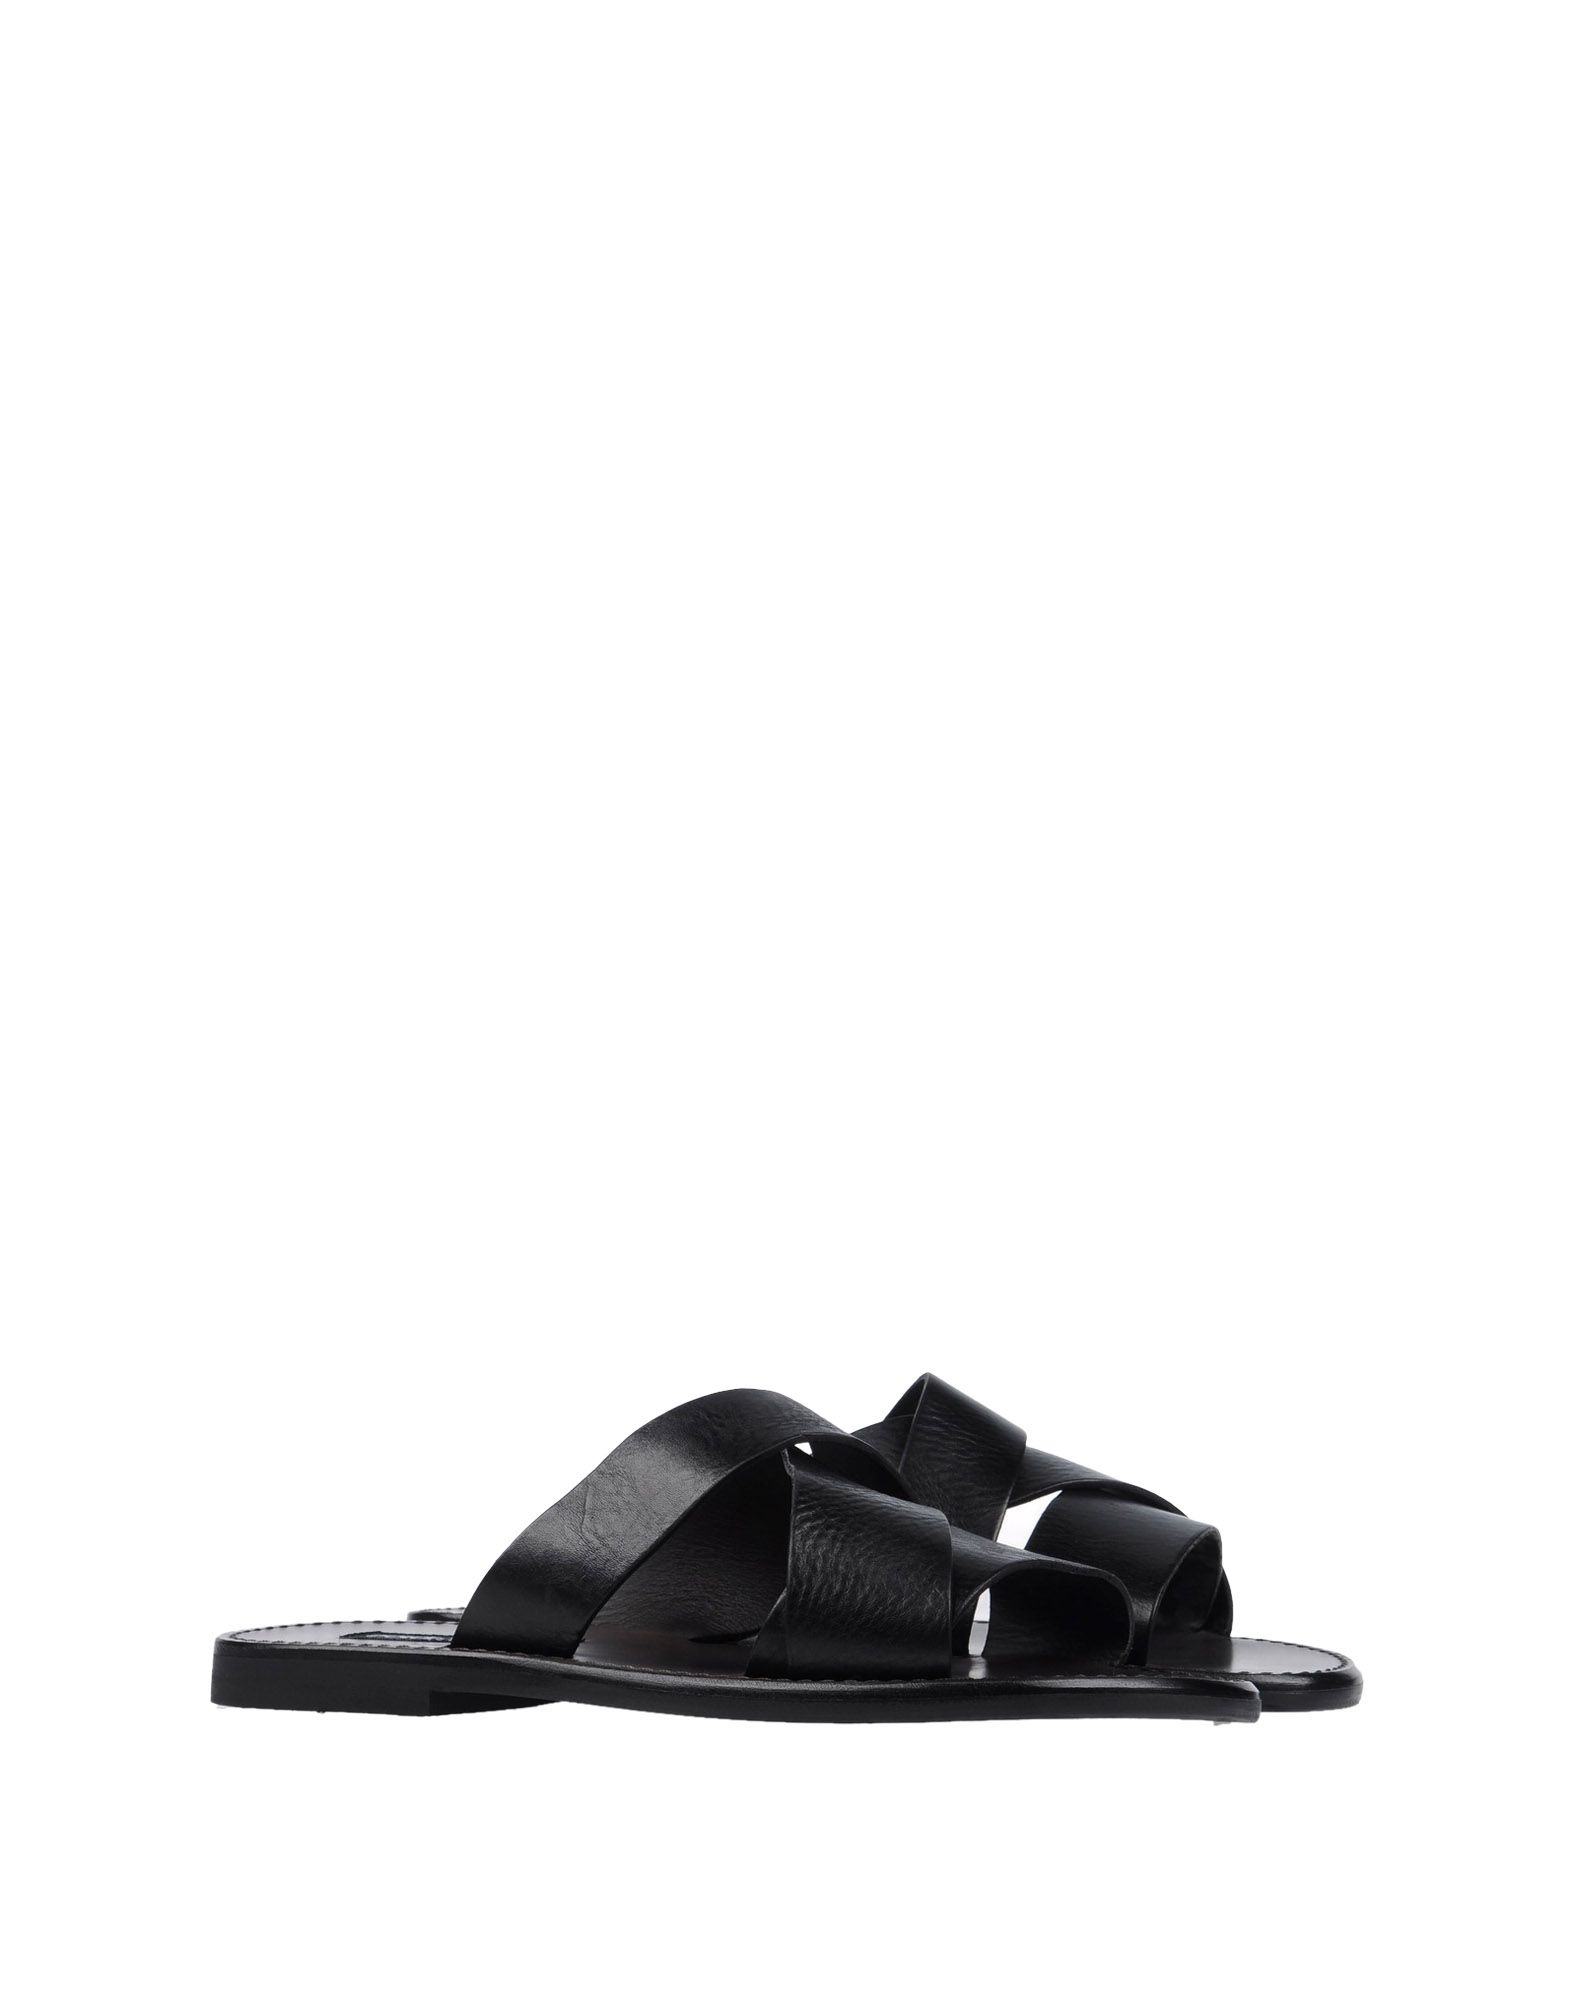 Dolce & Gabbana Sandalen Qualität Herren  11160605GG Gute Qualität Sandalen beliebte Schuhe 7a19ef